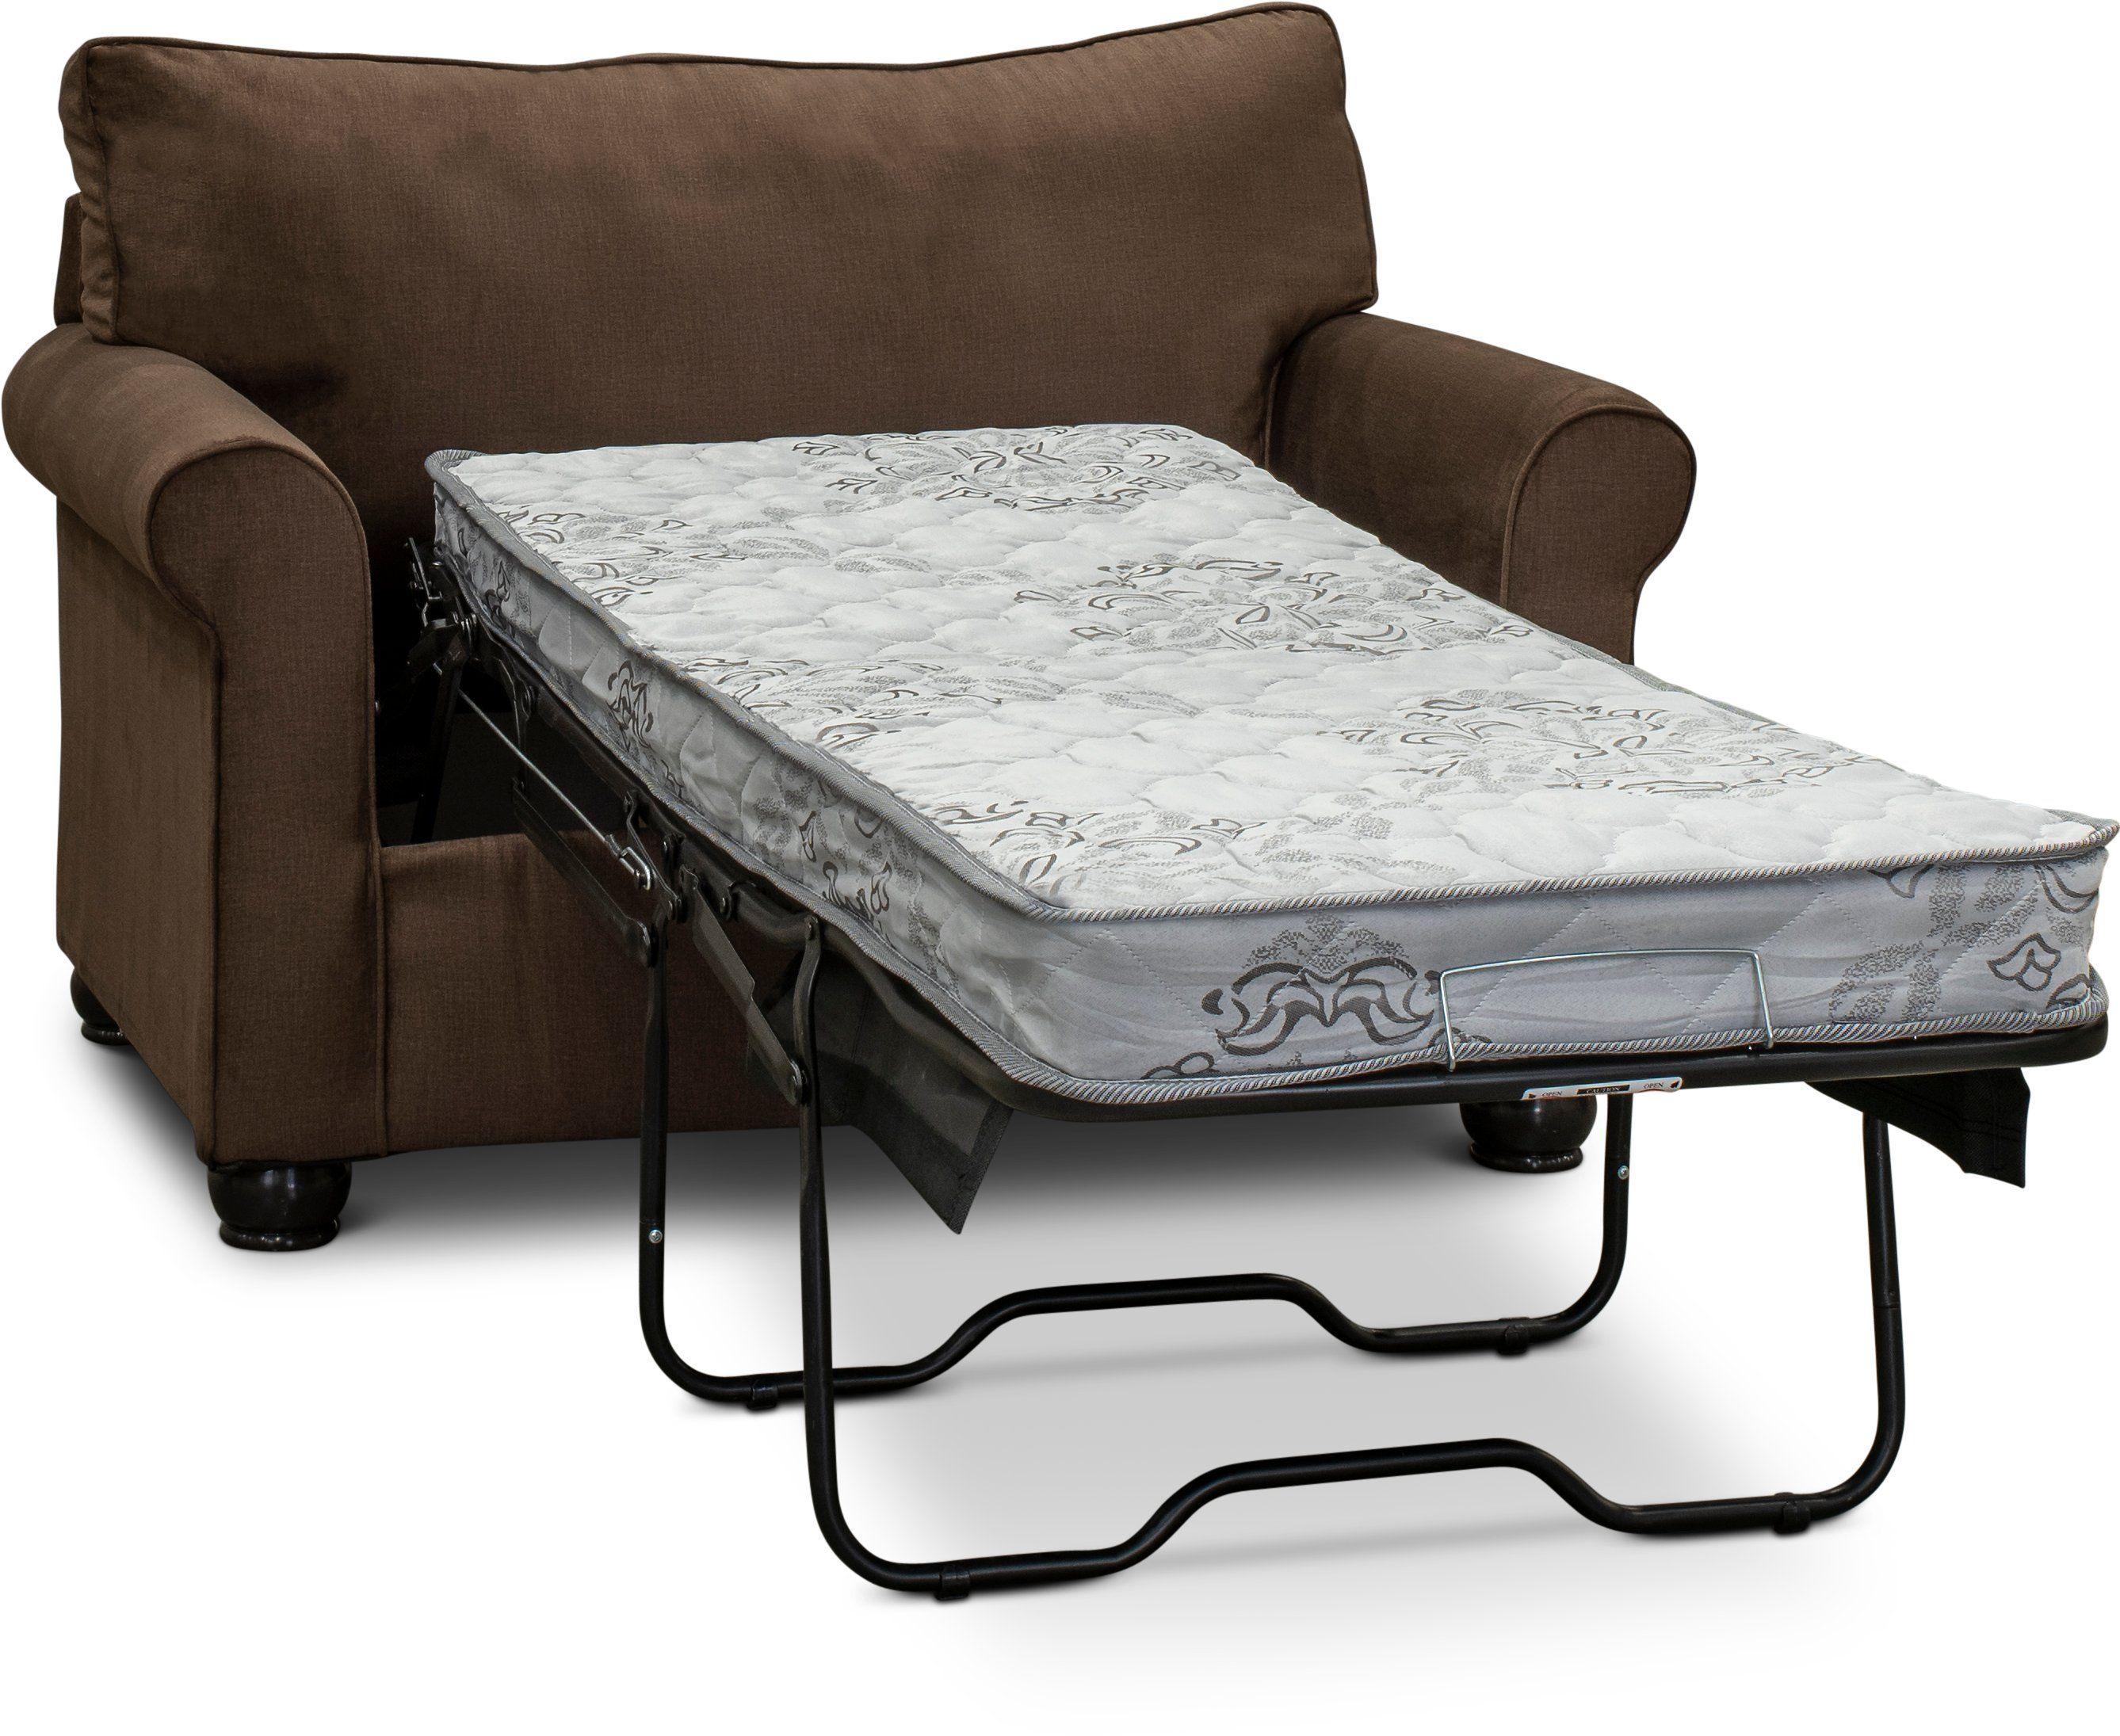 Superb Chocolate Brown Twin Sofa Bed Jojo 42Nd Street House Beatyapartments Chair Design Images Beatyapartmentscom